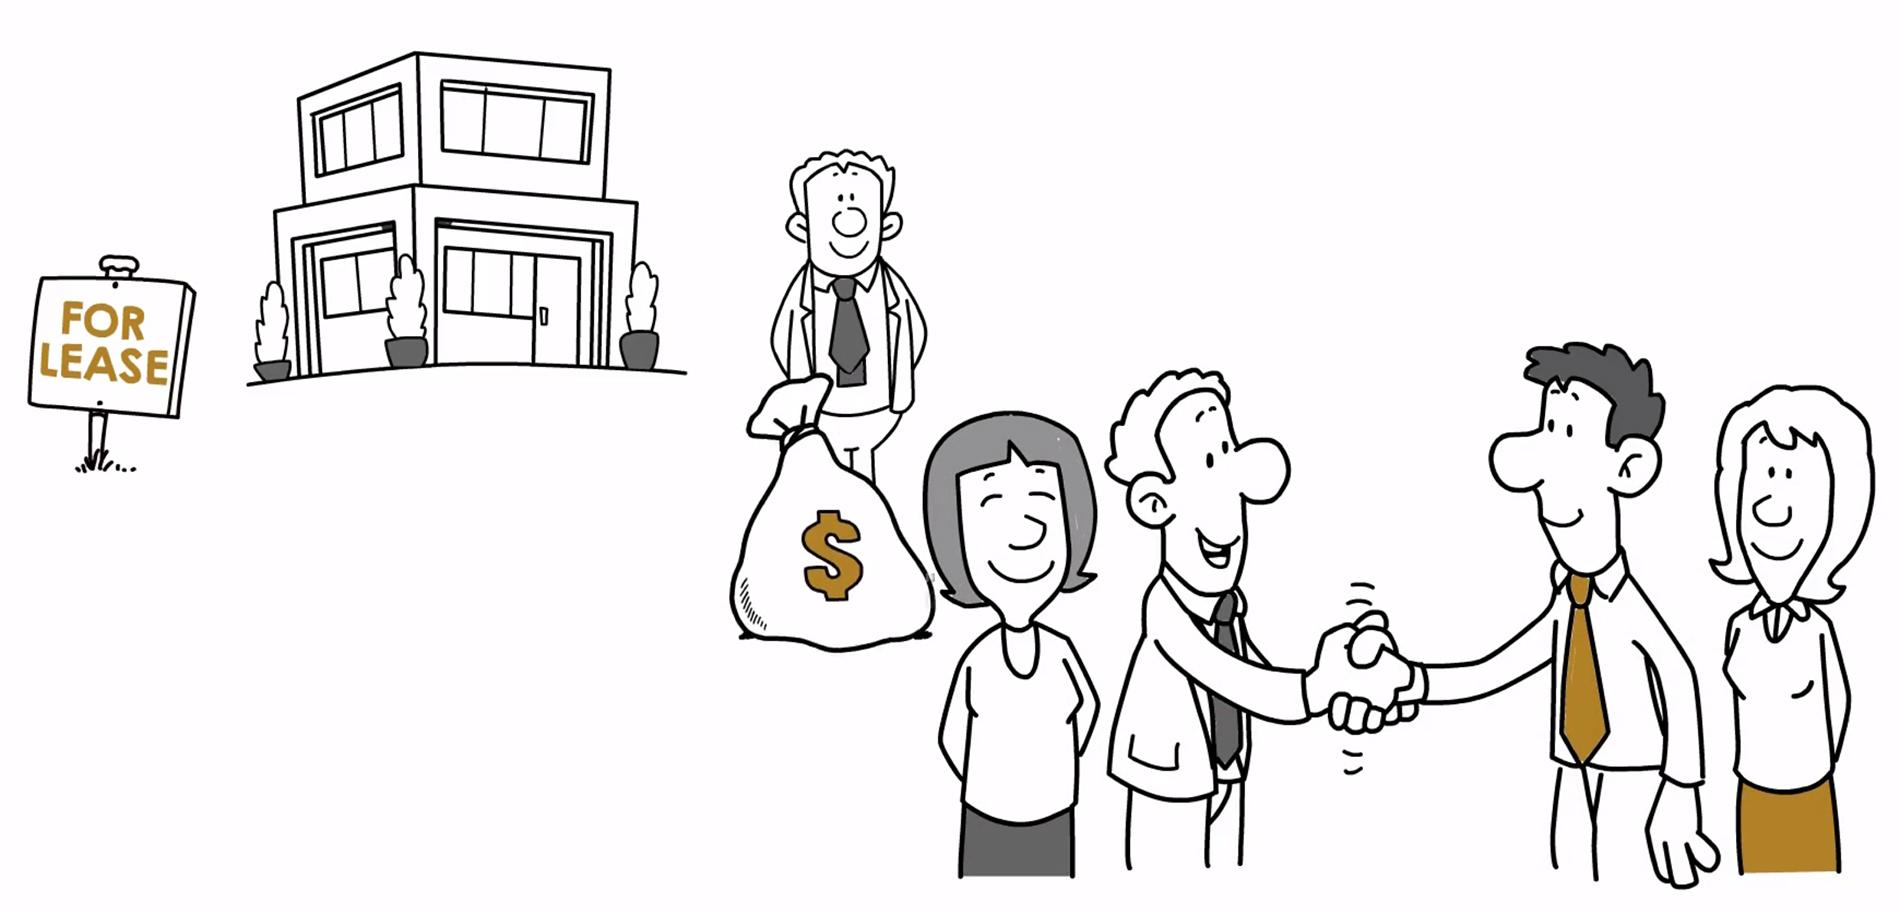 Landlord and Tenant Cartoon